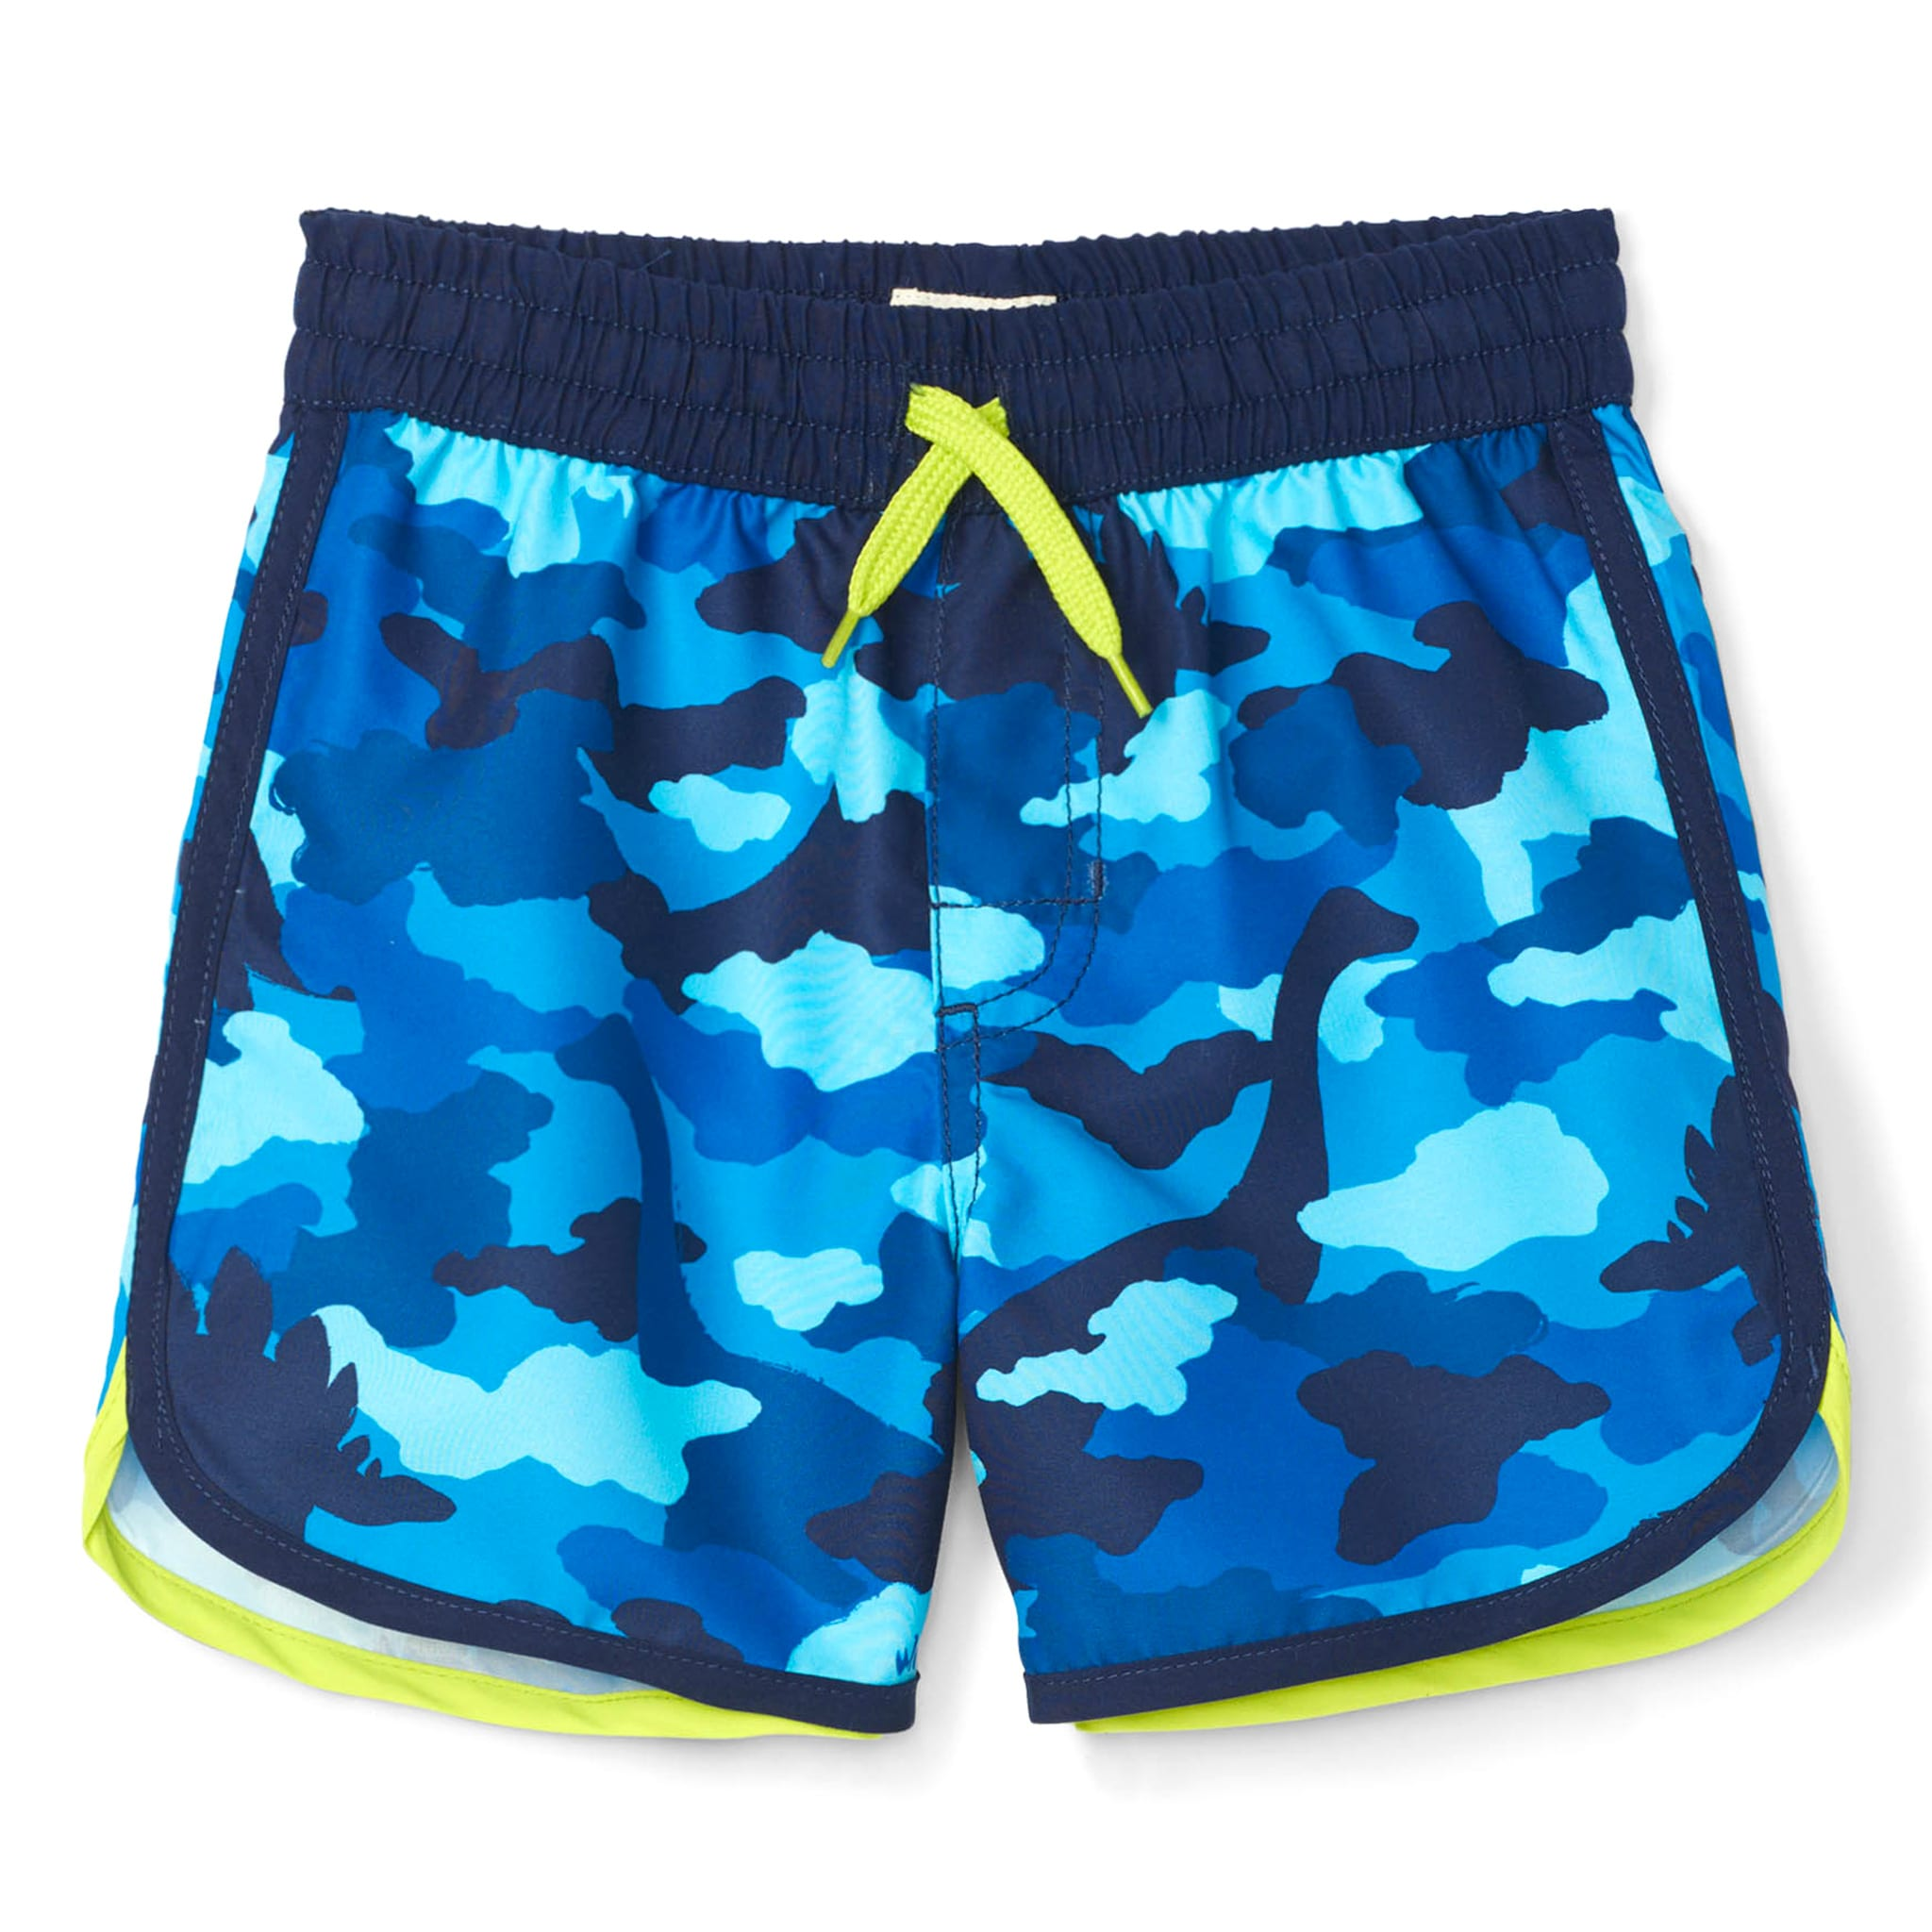 Hatley Swim Shorts Maillot de Bain Fille